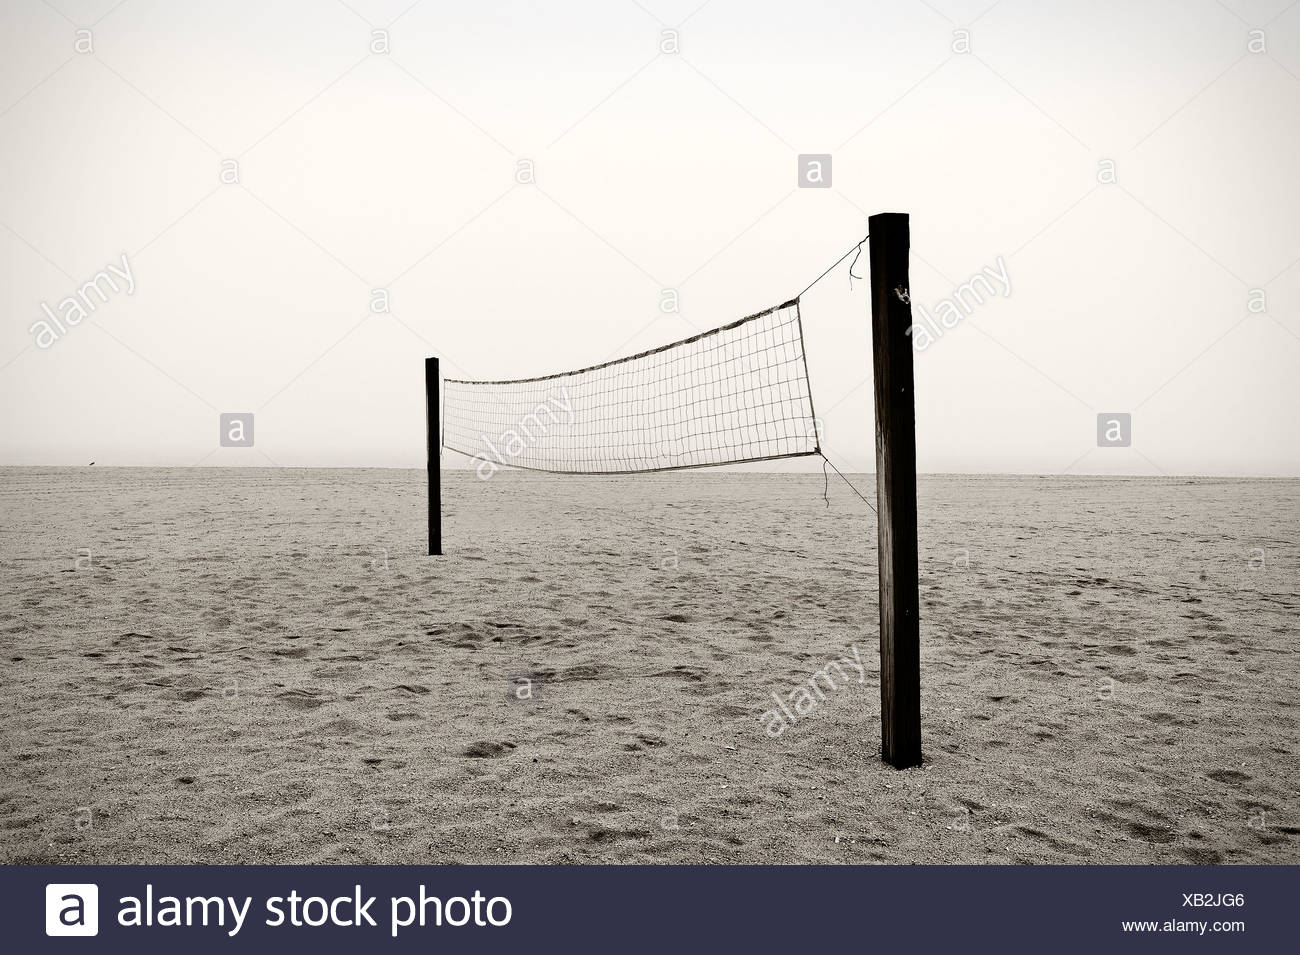 Beach volleyball net - Stock Image